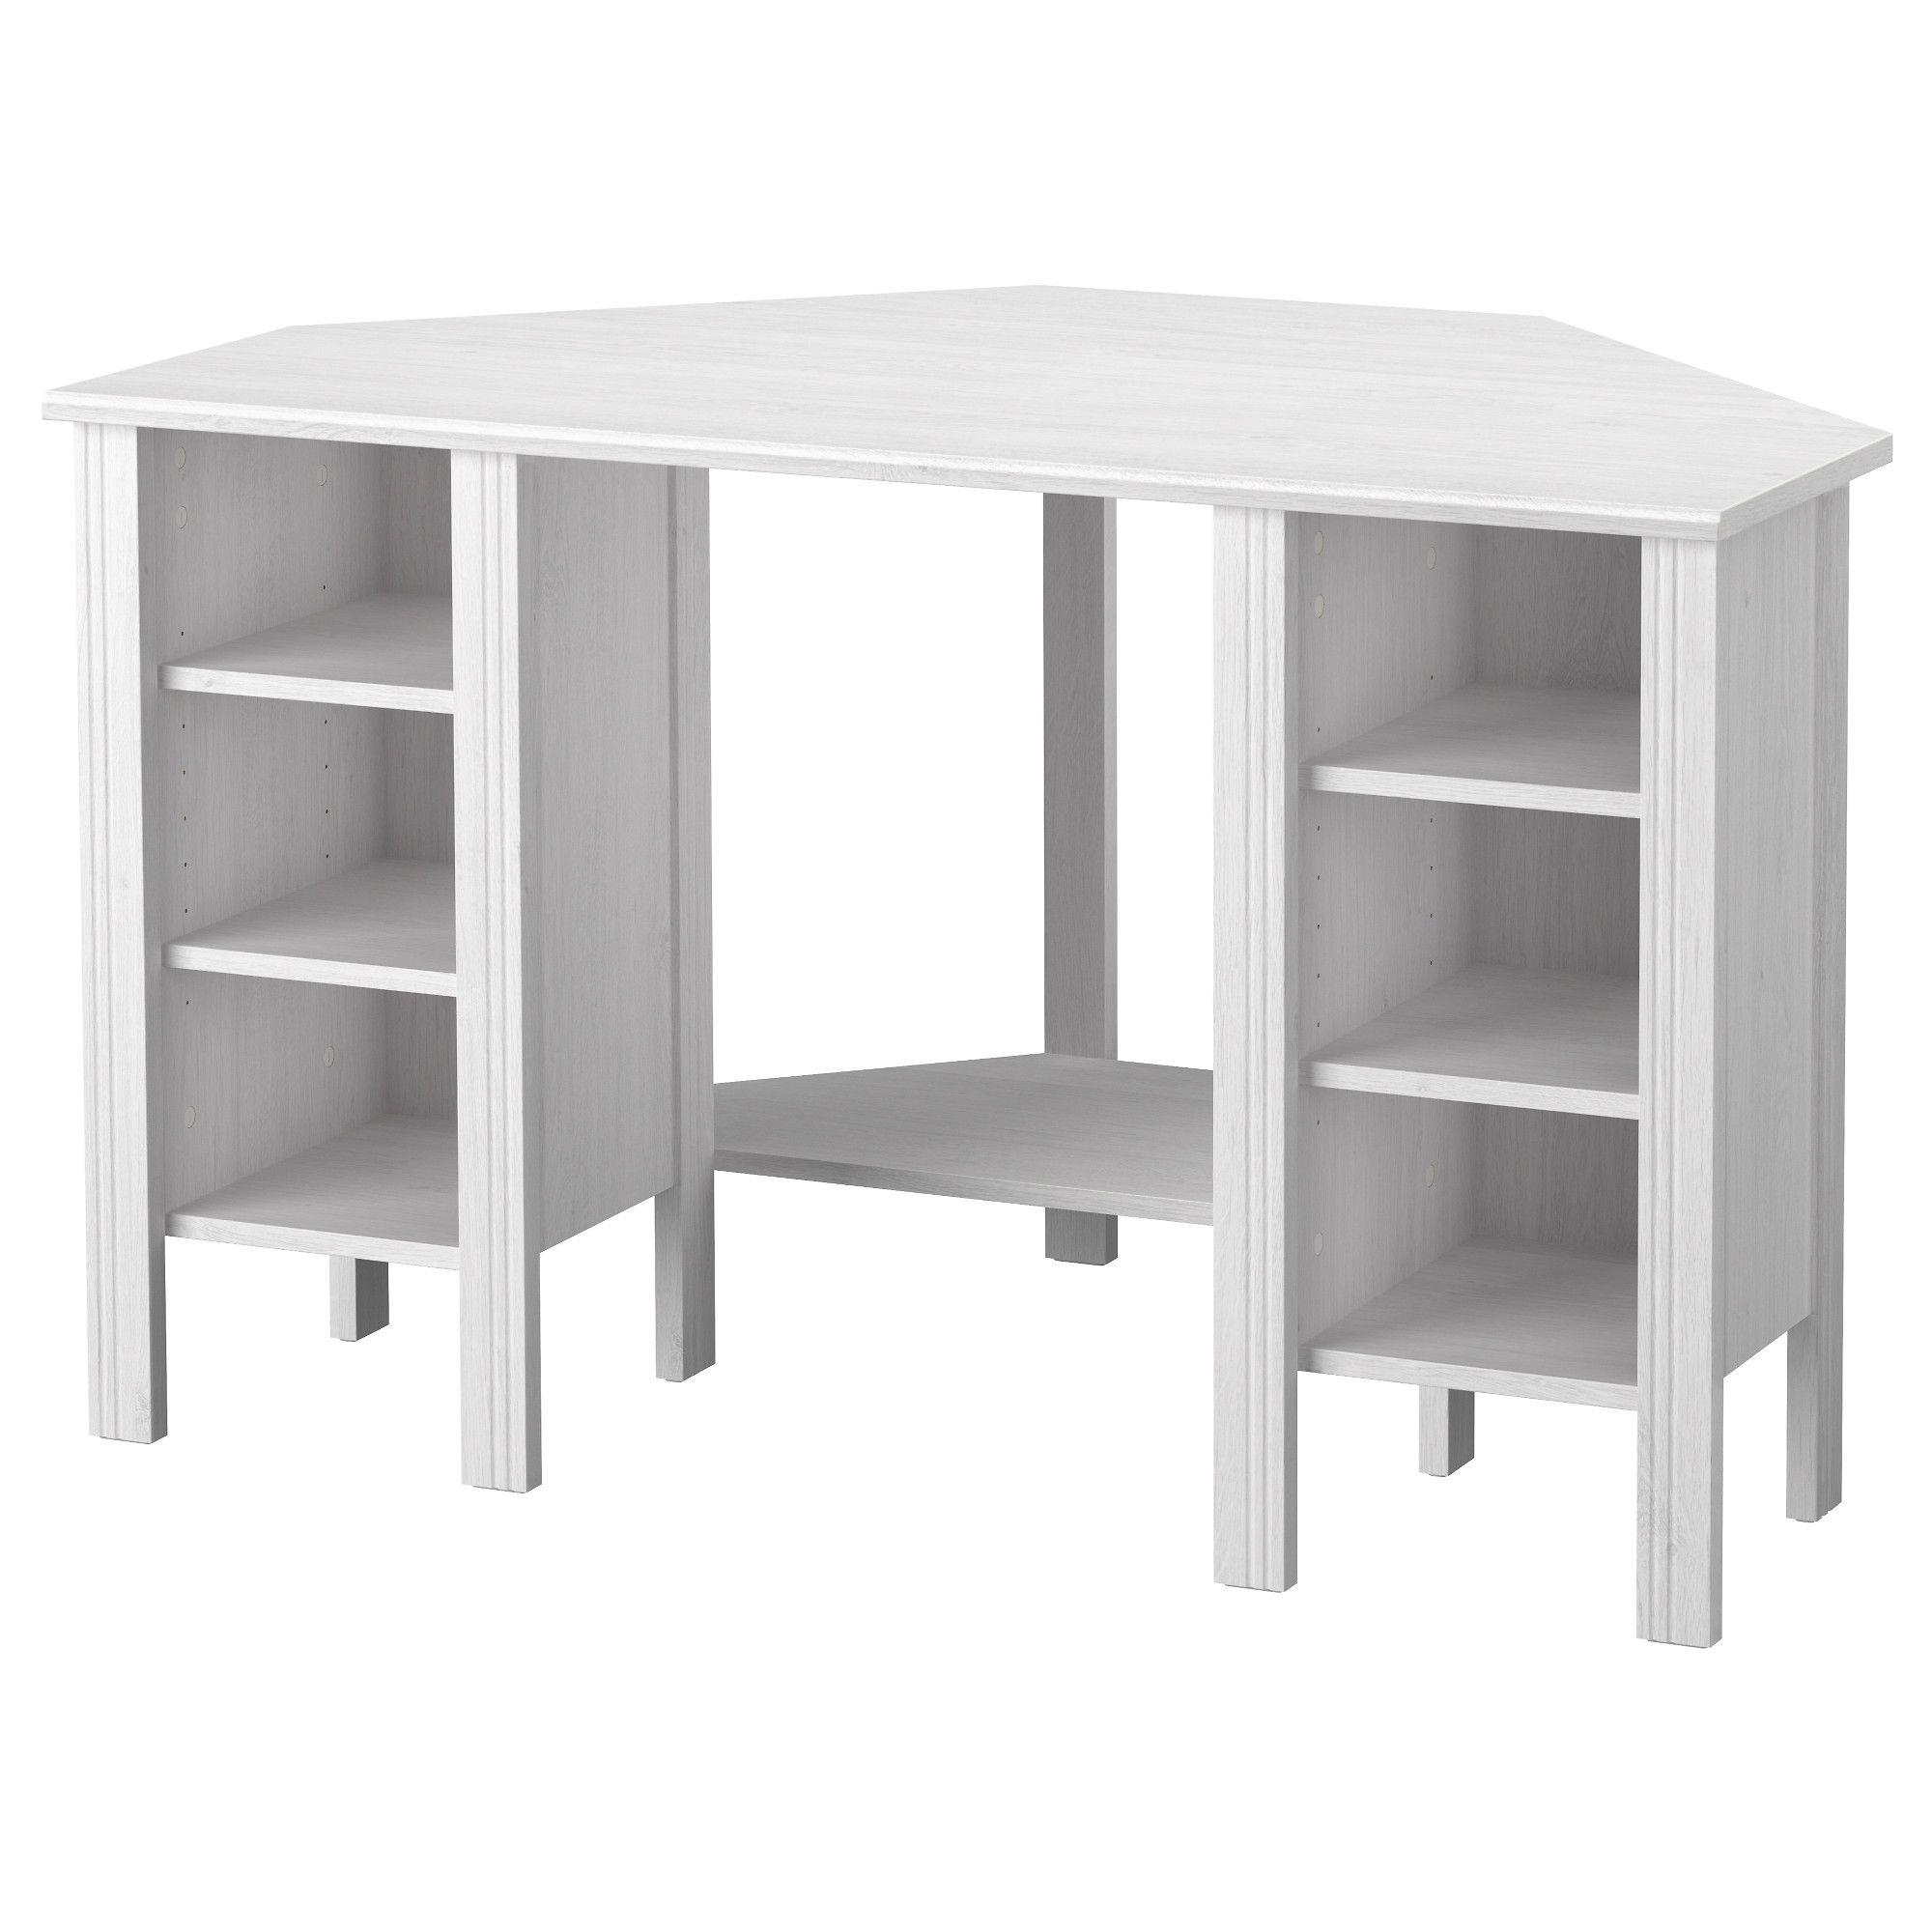 Fresh Home Furnishing Ideas And Affordable Furniture Small Corner Desk White Corner Desk Ikea Corner Desk